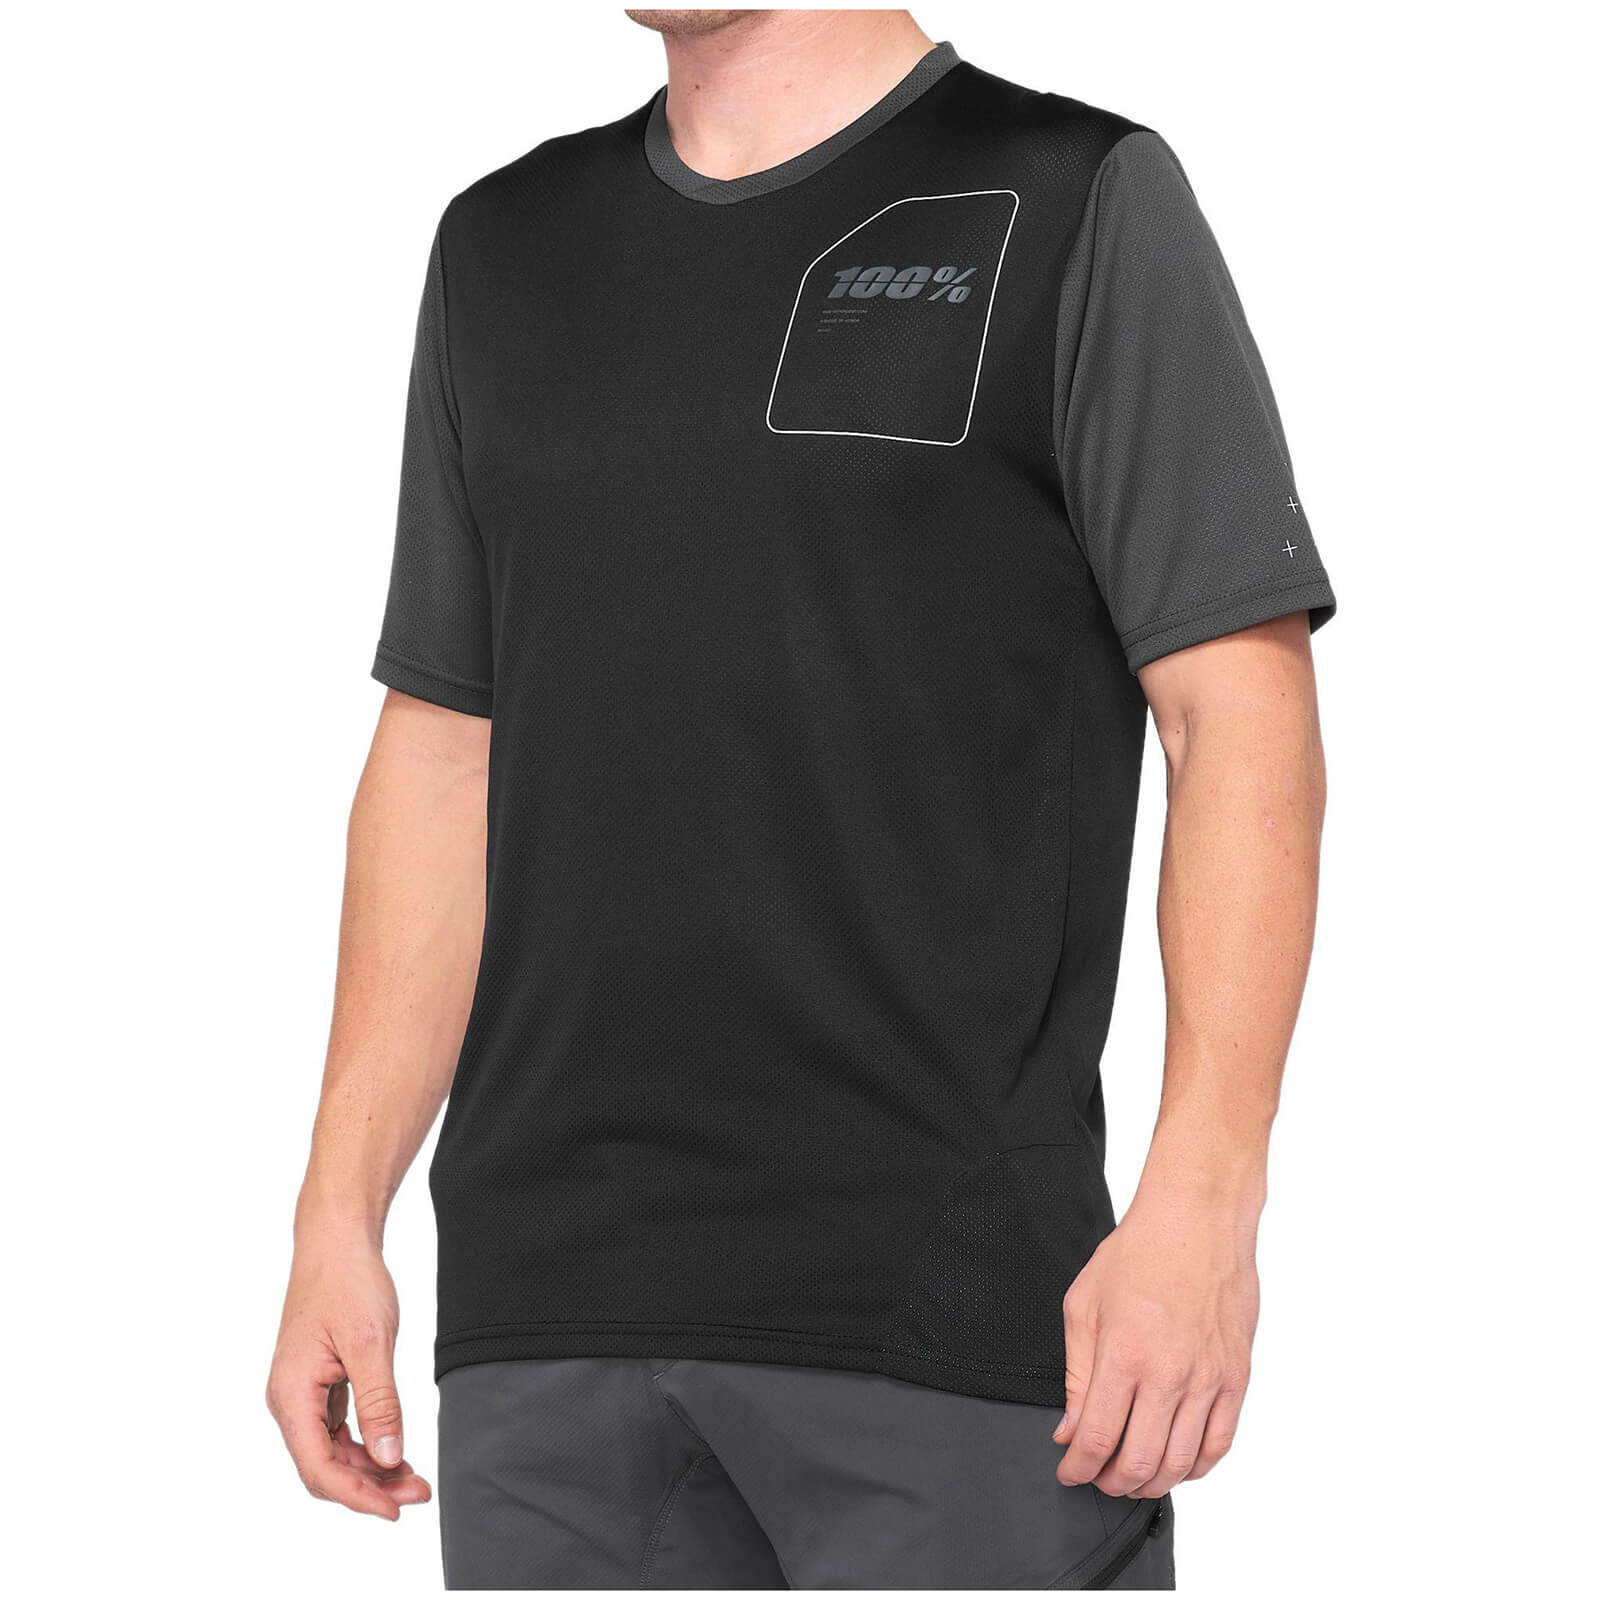 100% Ridecamp Mtb Jersey - M - Charcoal/black